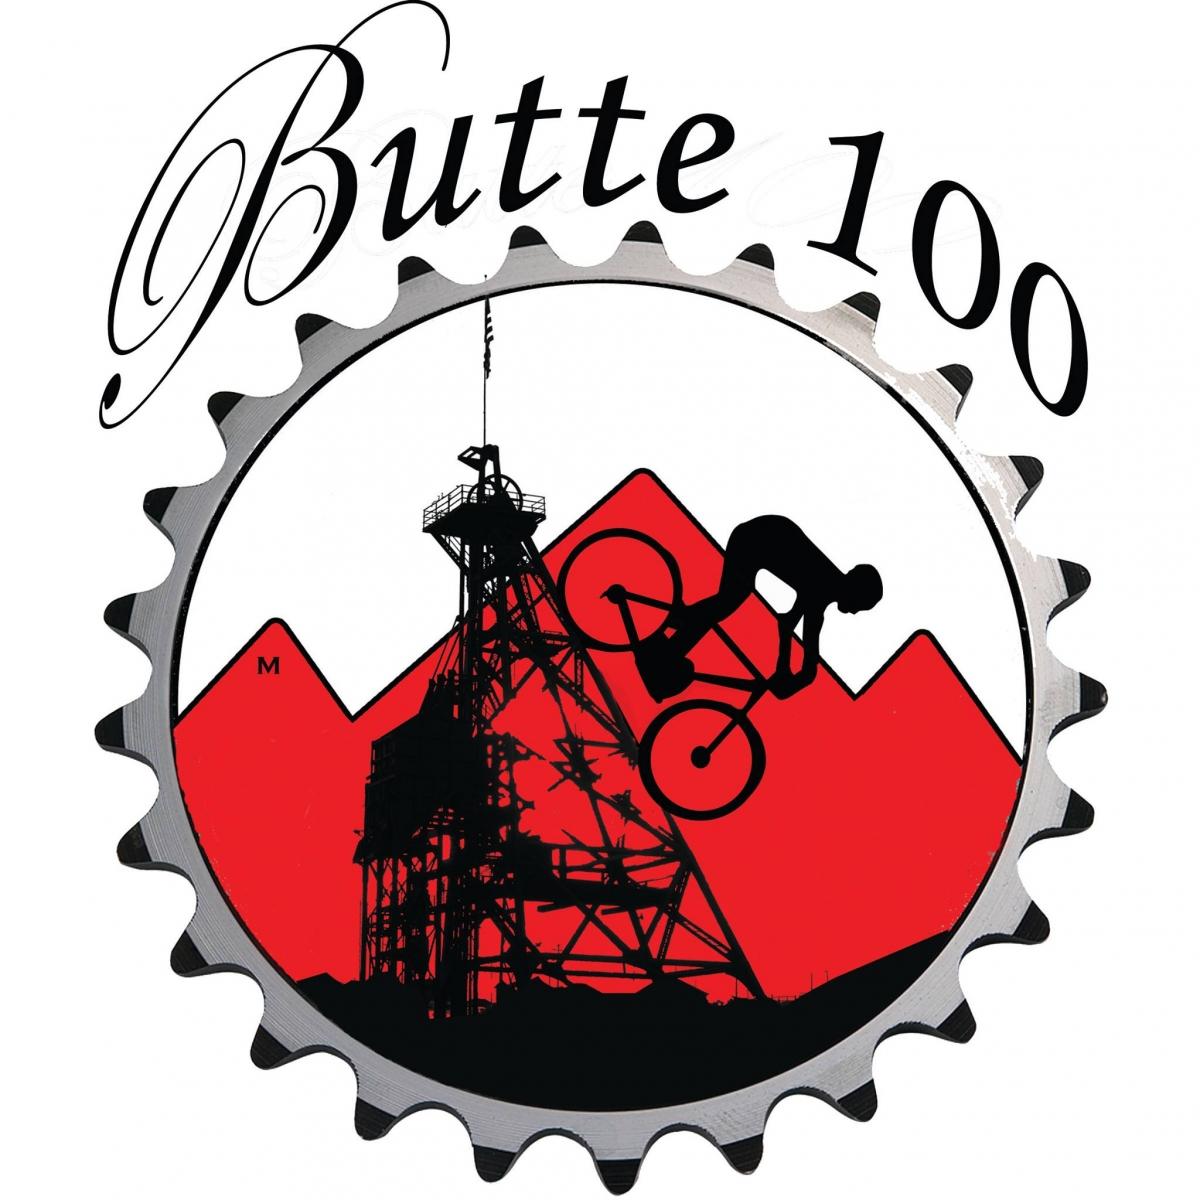 Butte 100